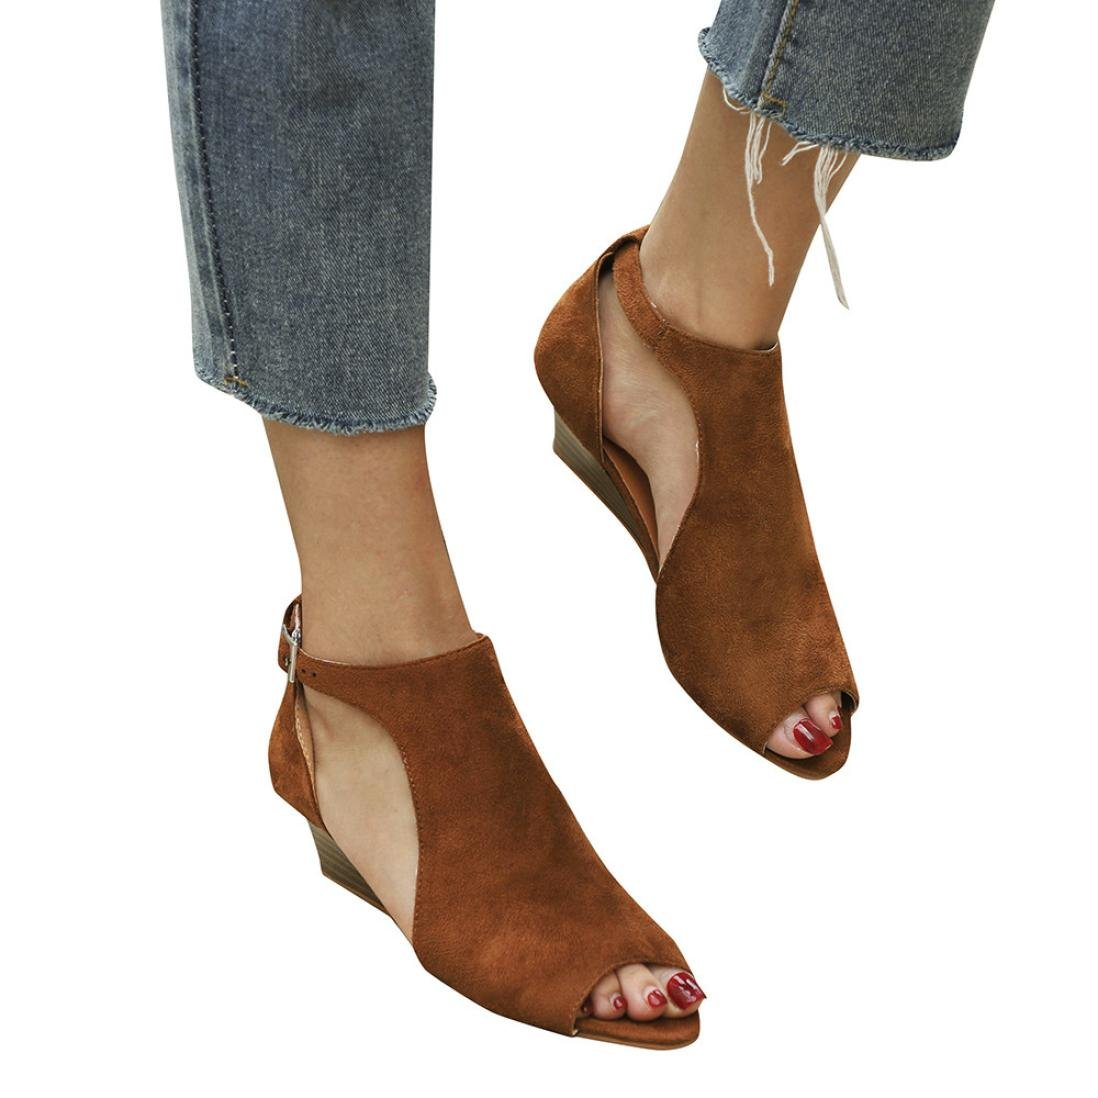 WensLTD Women's Espadrille Platform Wedge Sandals Ankle Strap Cut Out Peep Toe Shoes B07D8KBFVK 8|Brown